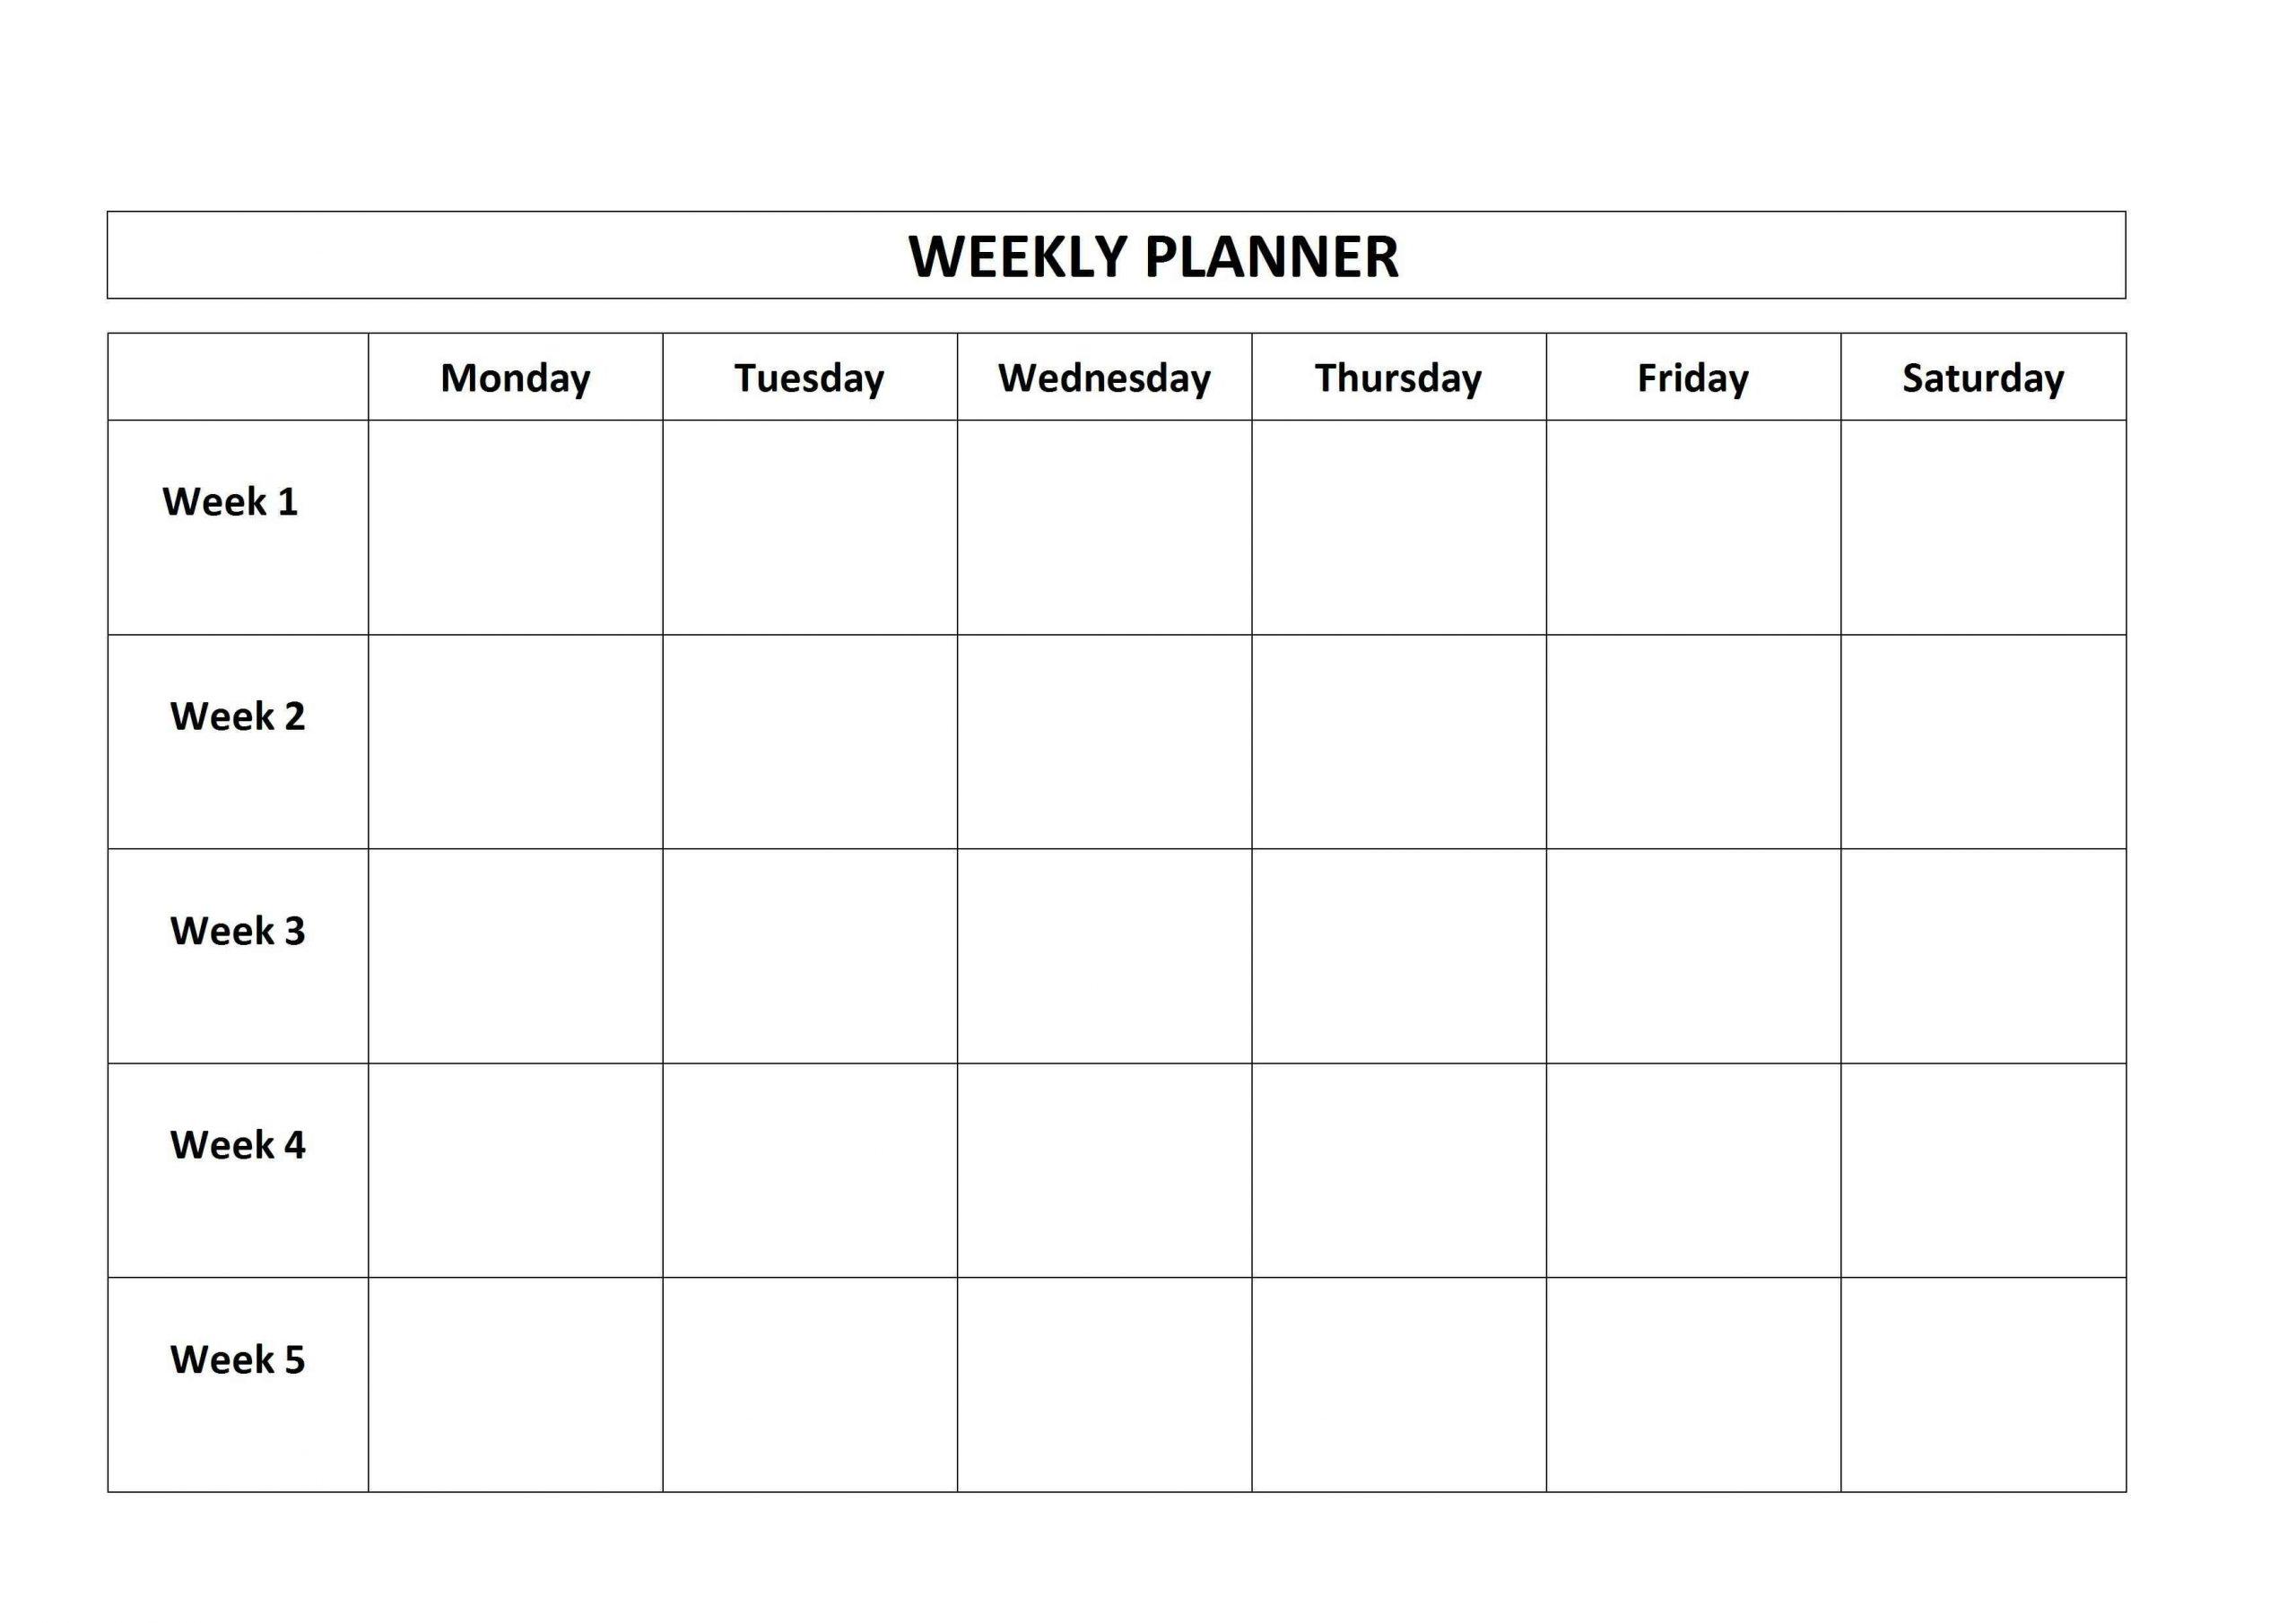 Blank Monday Through Friday Calendars   Example Calendar 1 Week Calendar Printable